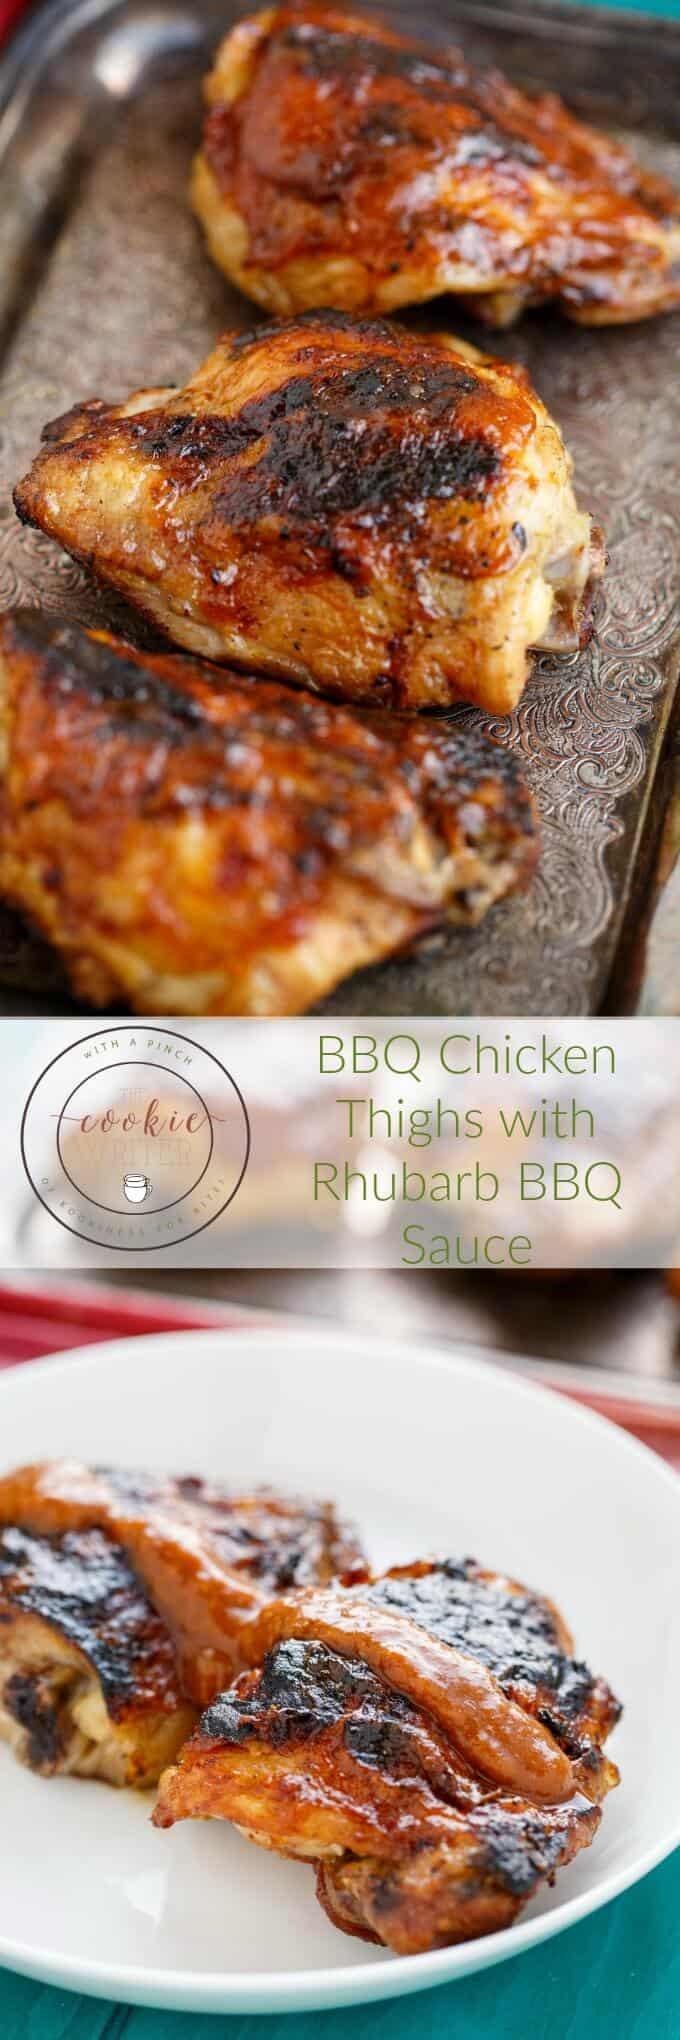 BBQ Chicken Thighs with Rhubarb BBQ Sauce